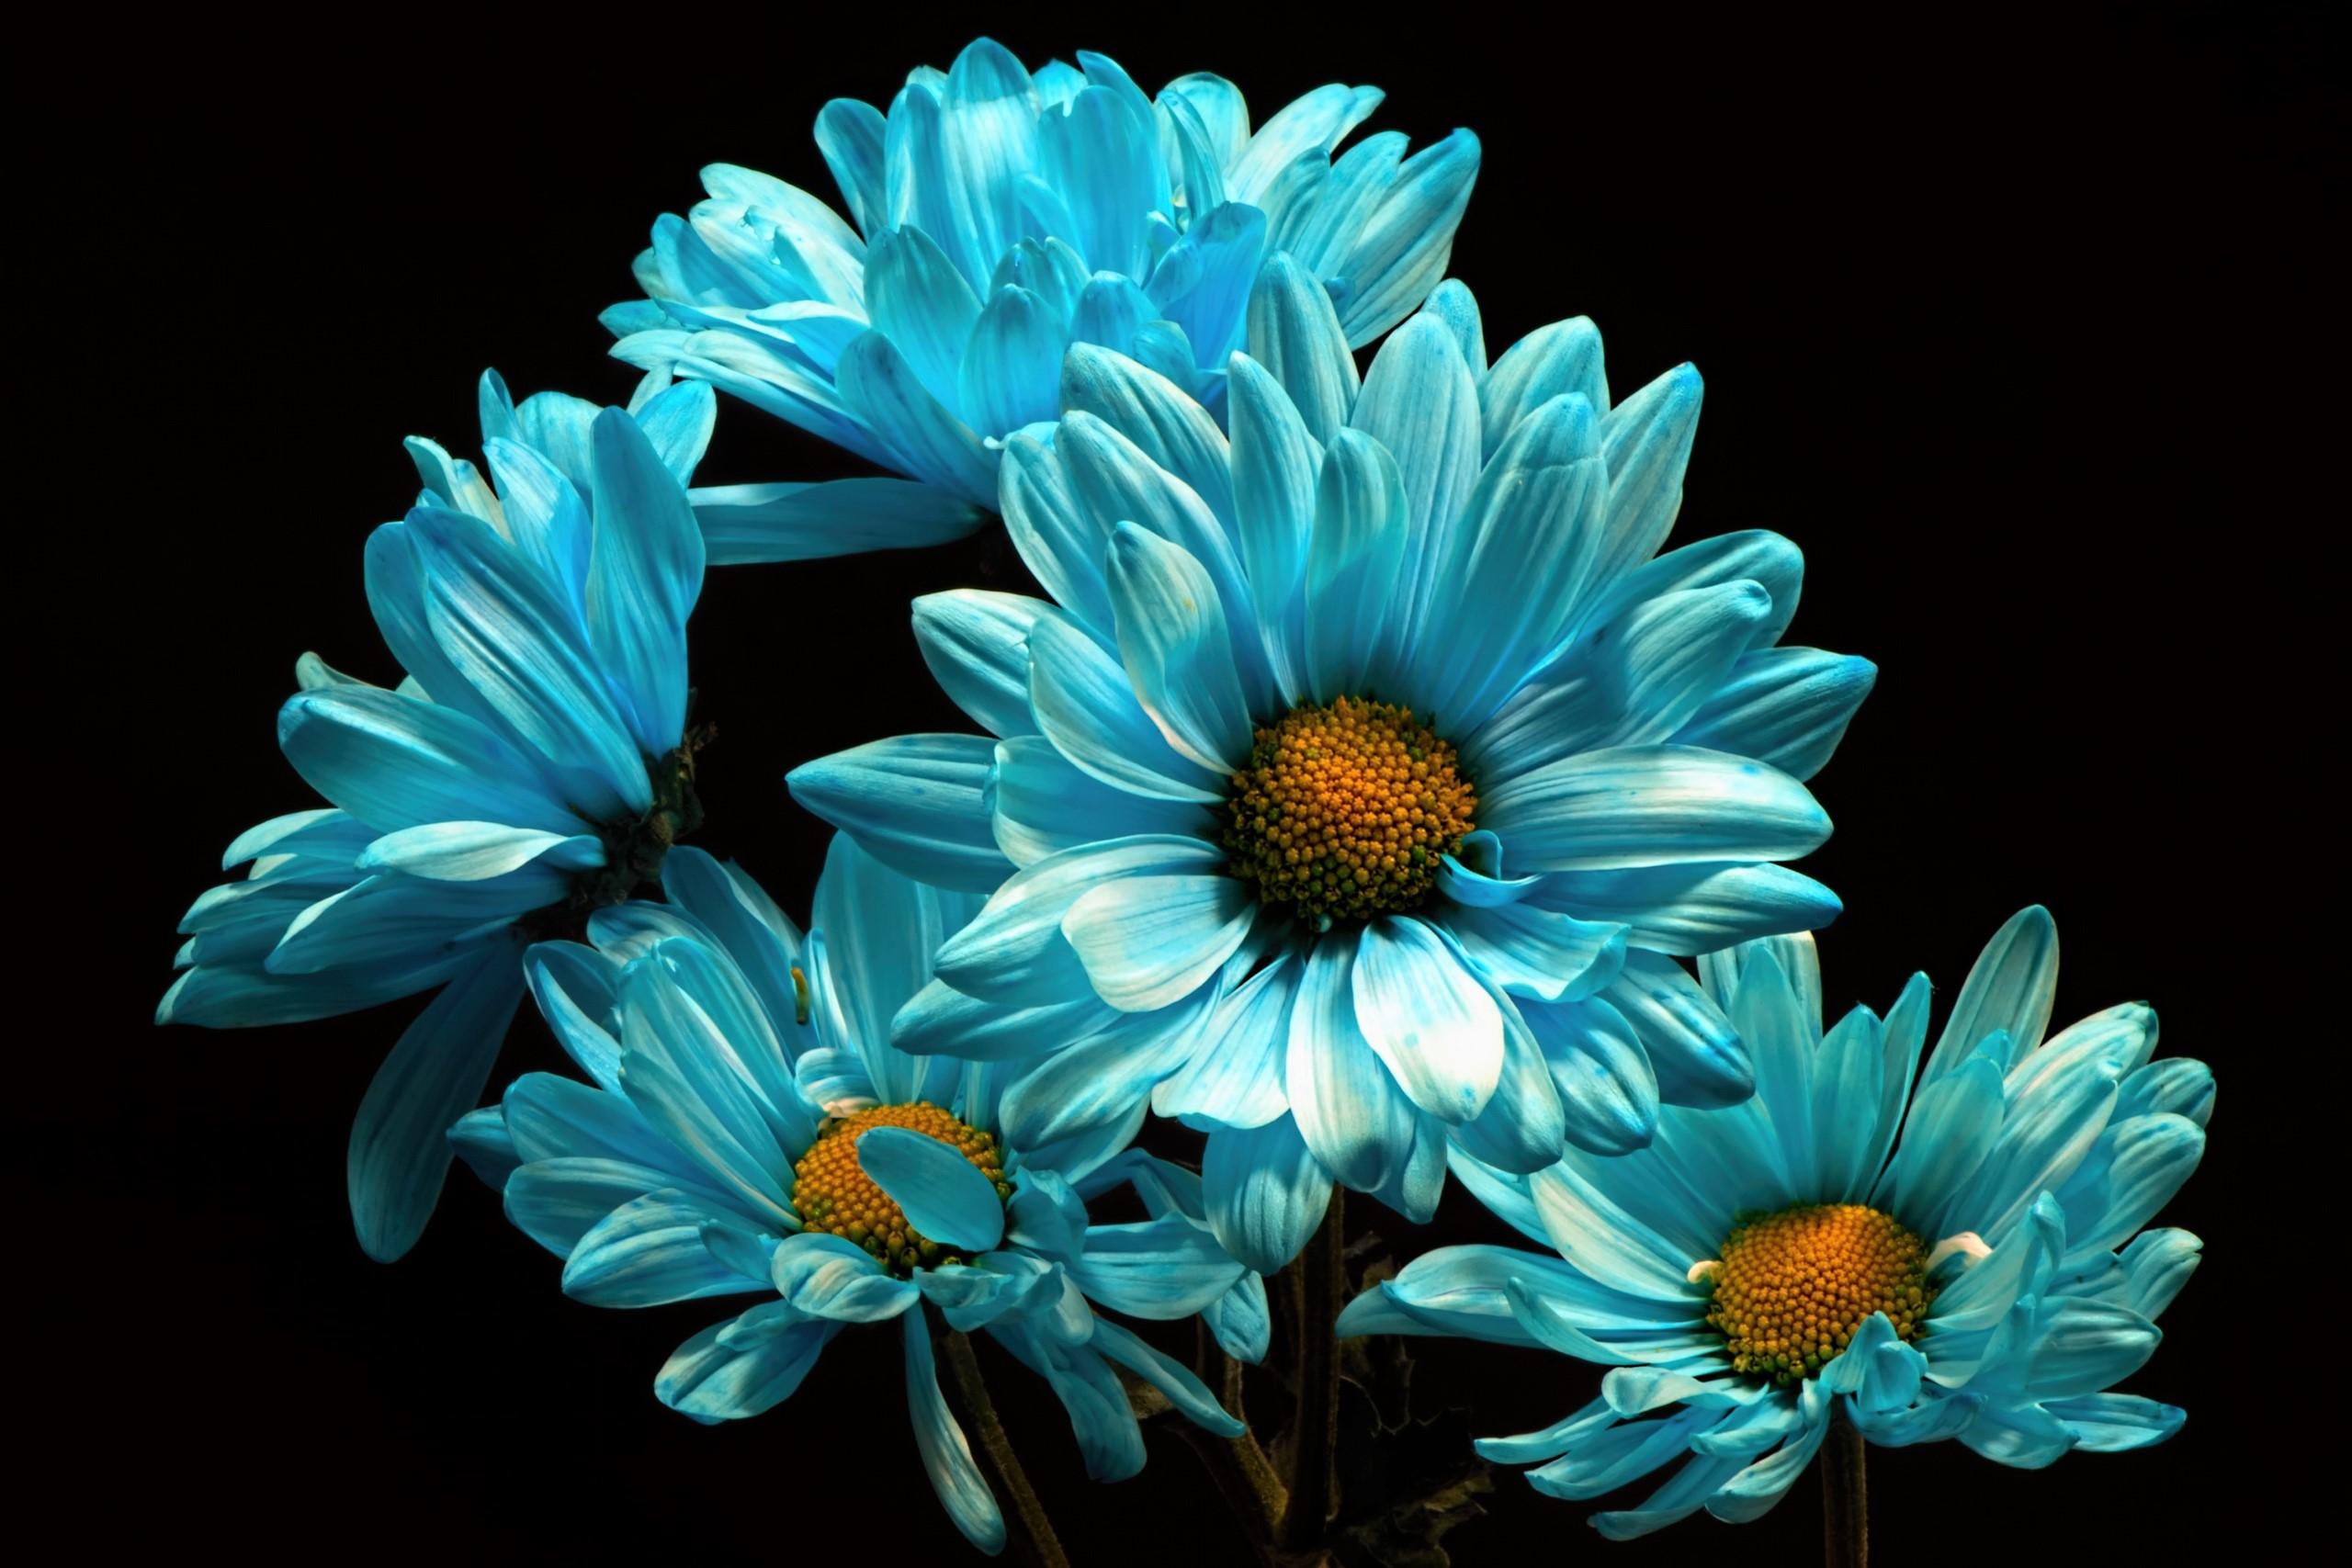 Blue Flower Daisy Earth Flower wallpaper | 2560x1707 ...